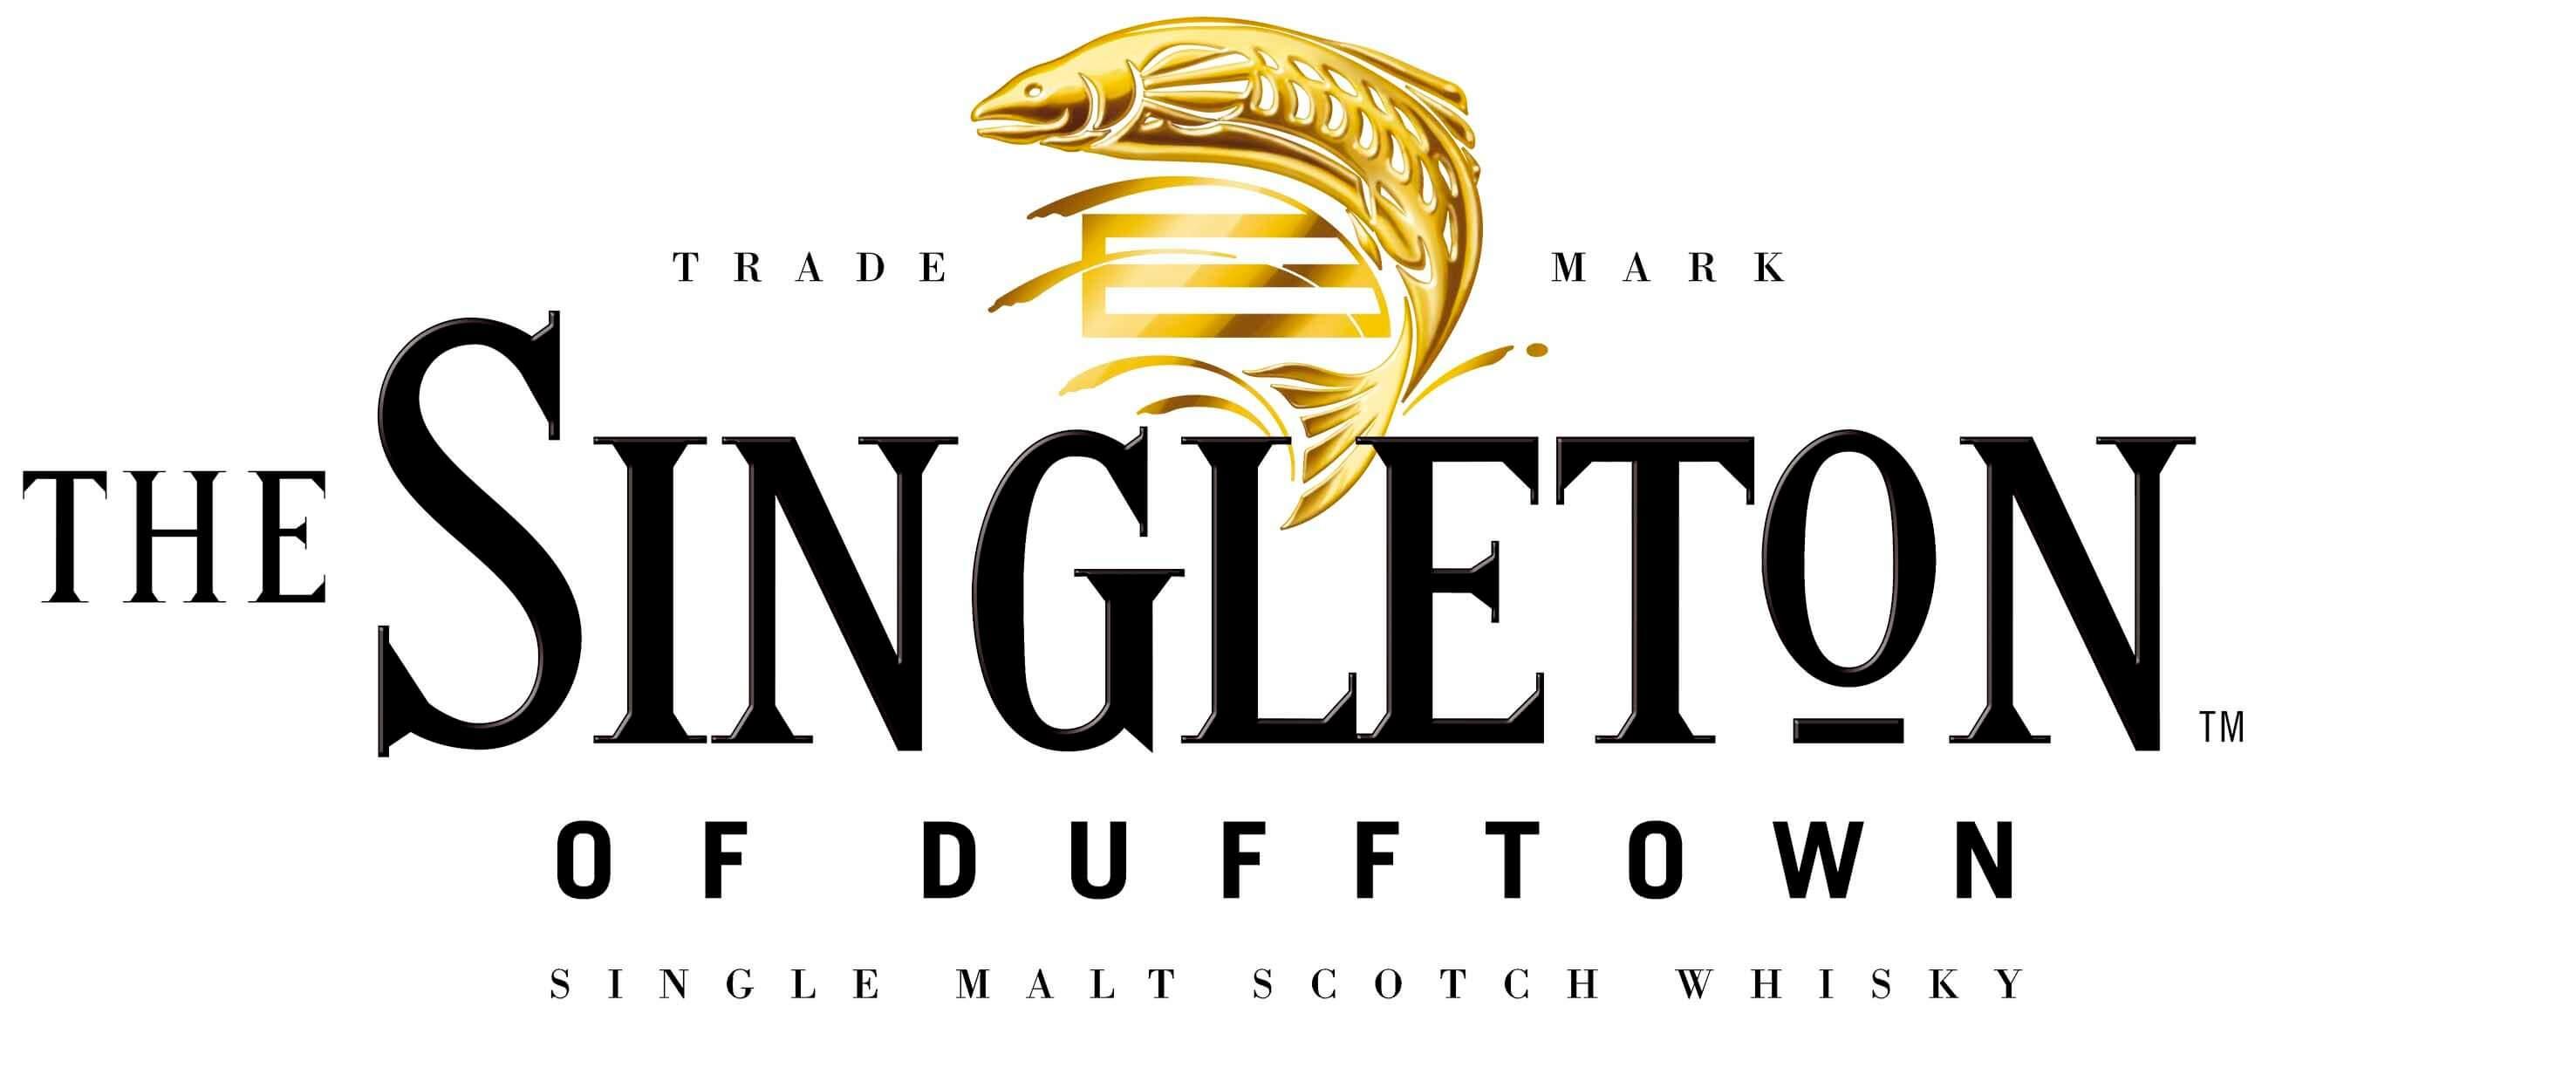 The Singleton - Dufftown Distillery